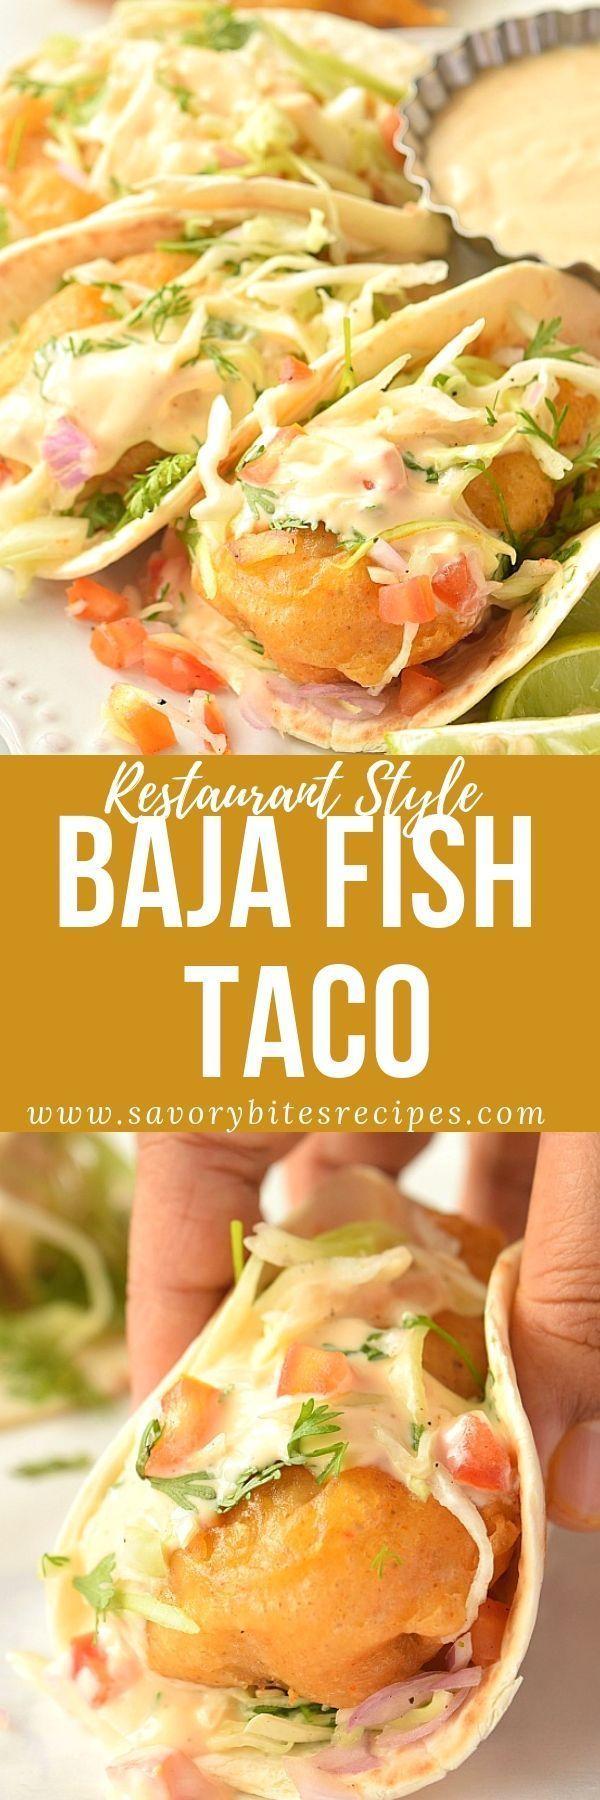 Das ultimative knusprige Baja-Fisch-Taco-Rezept Das ultimative knusprige Baja-Fisch-Taco-Rezept,